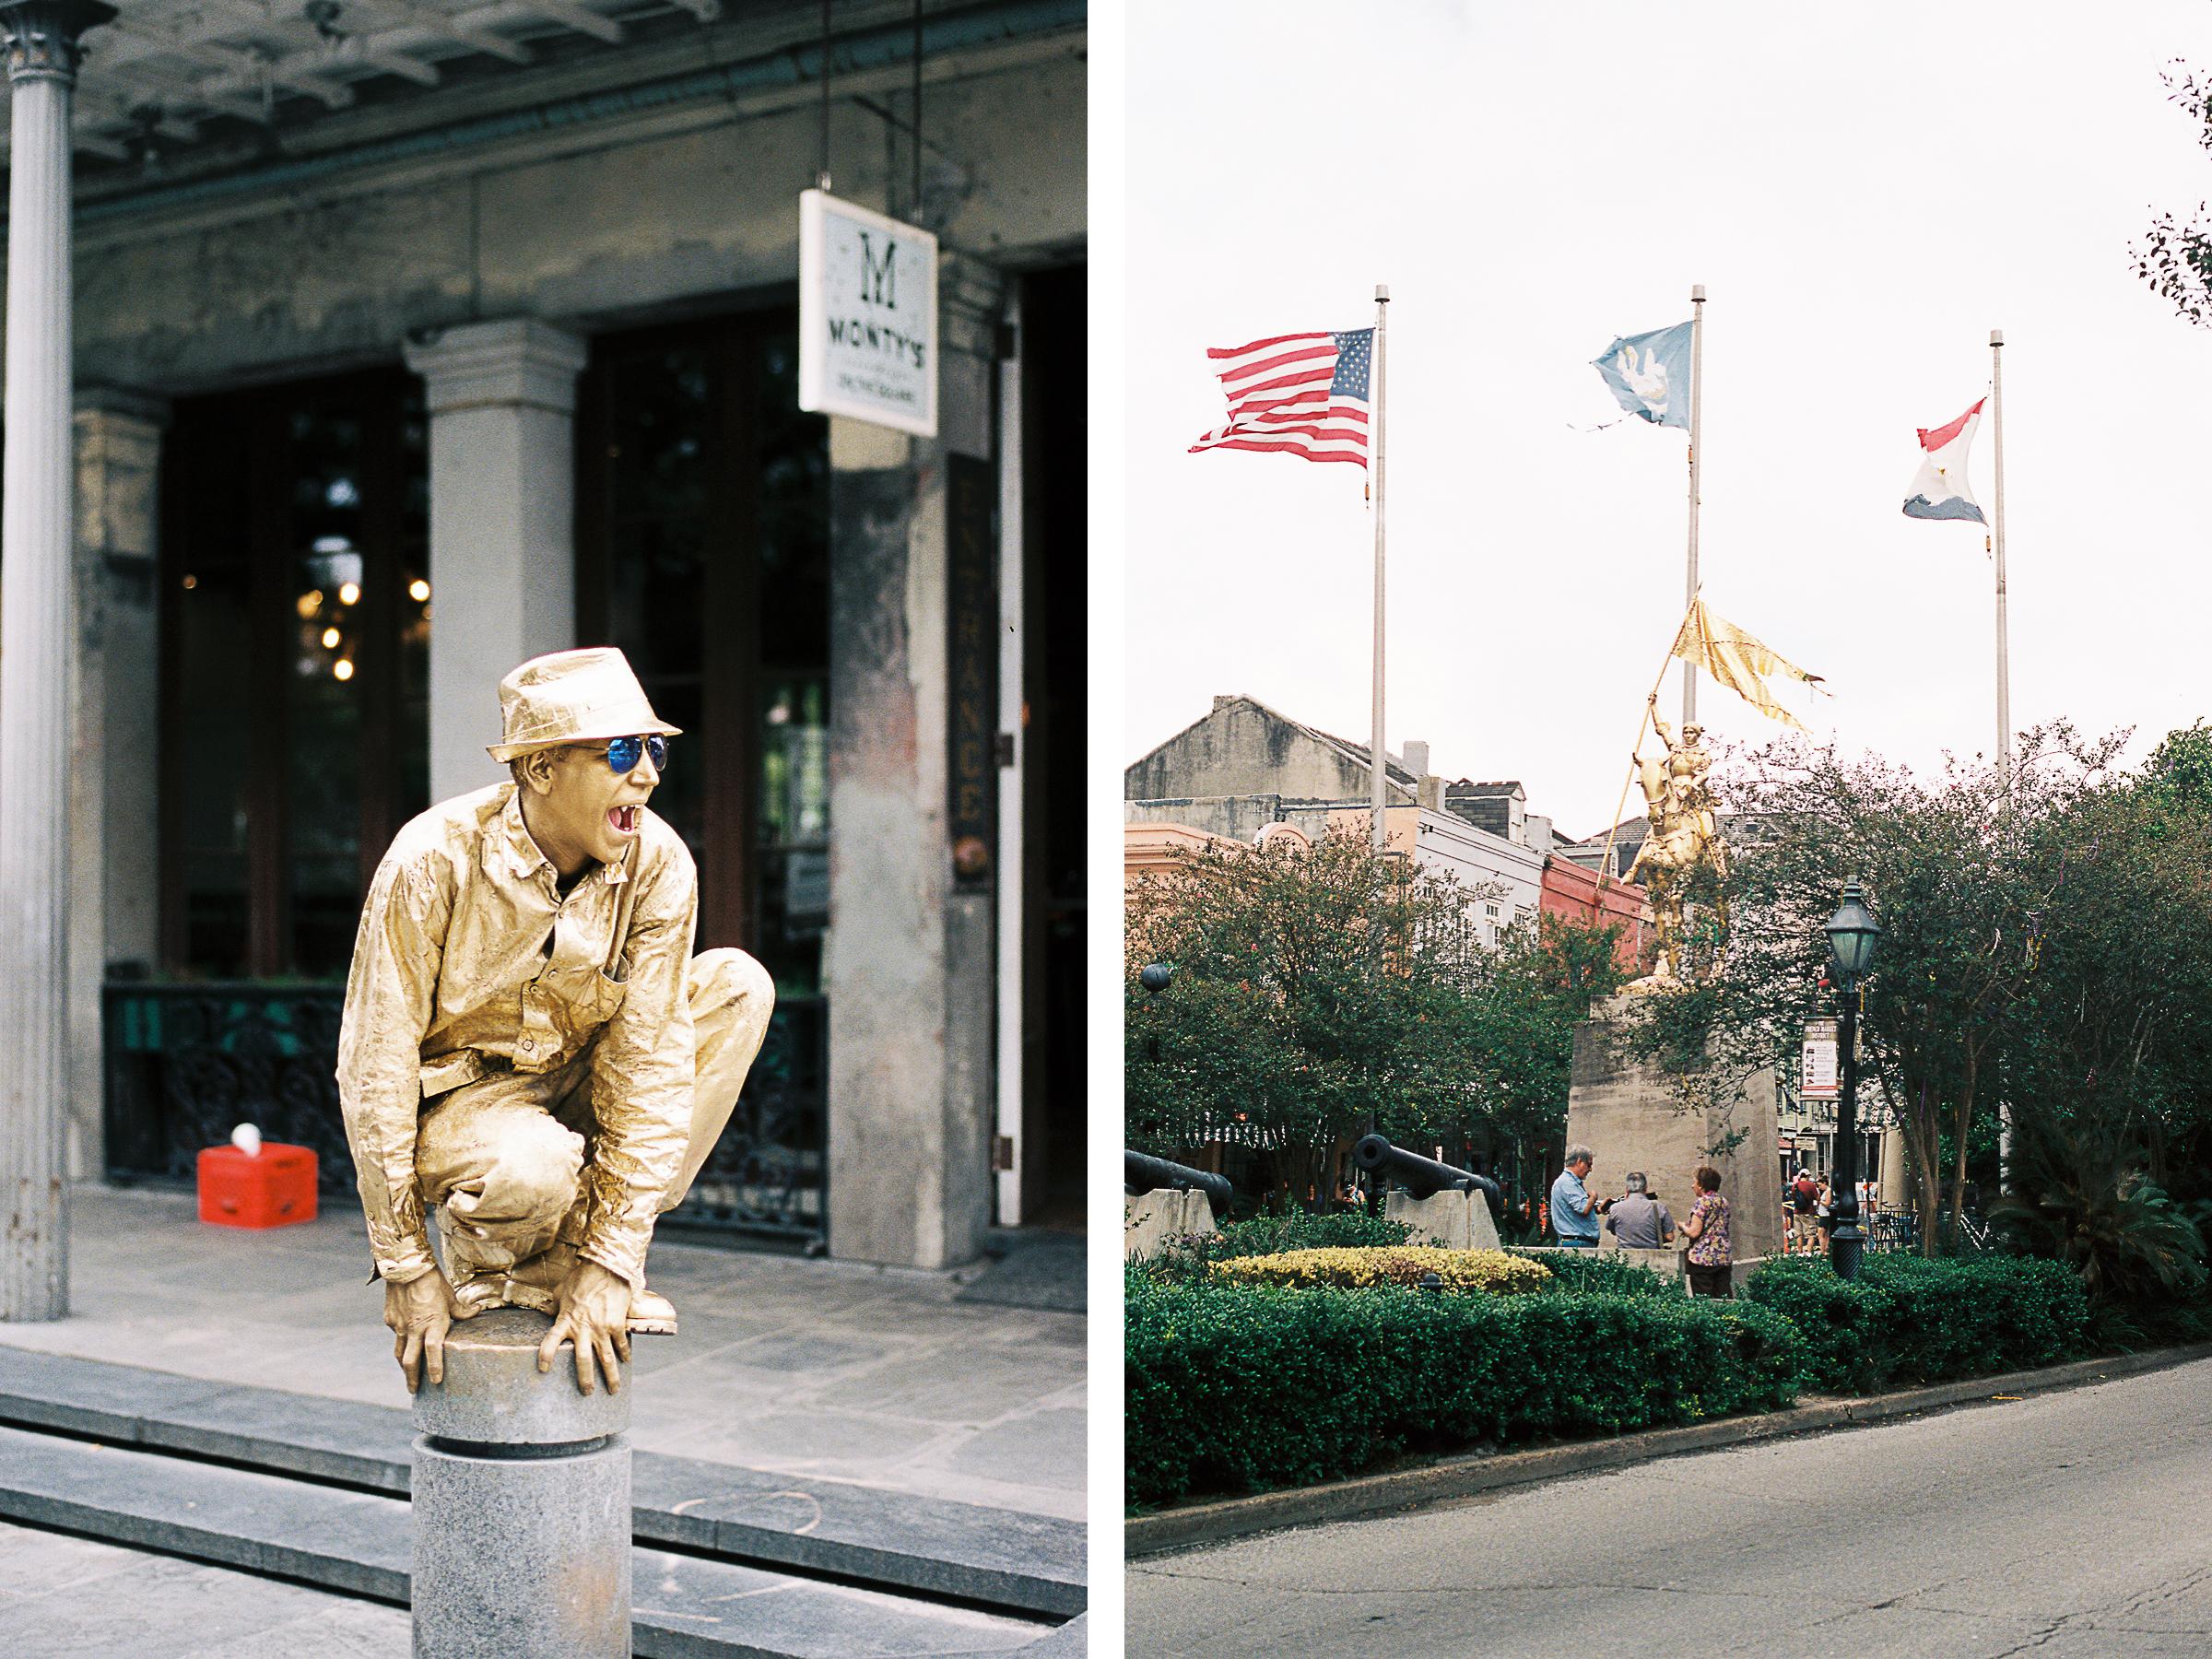 New-Orleans-Travel-Destination-Photography-4.jpg